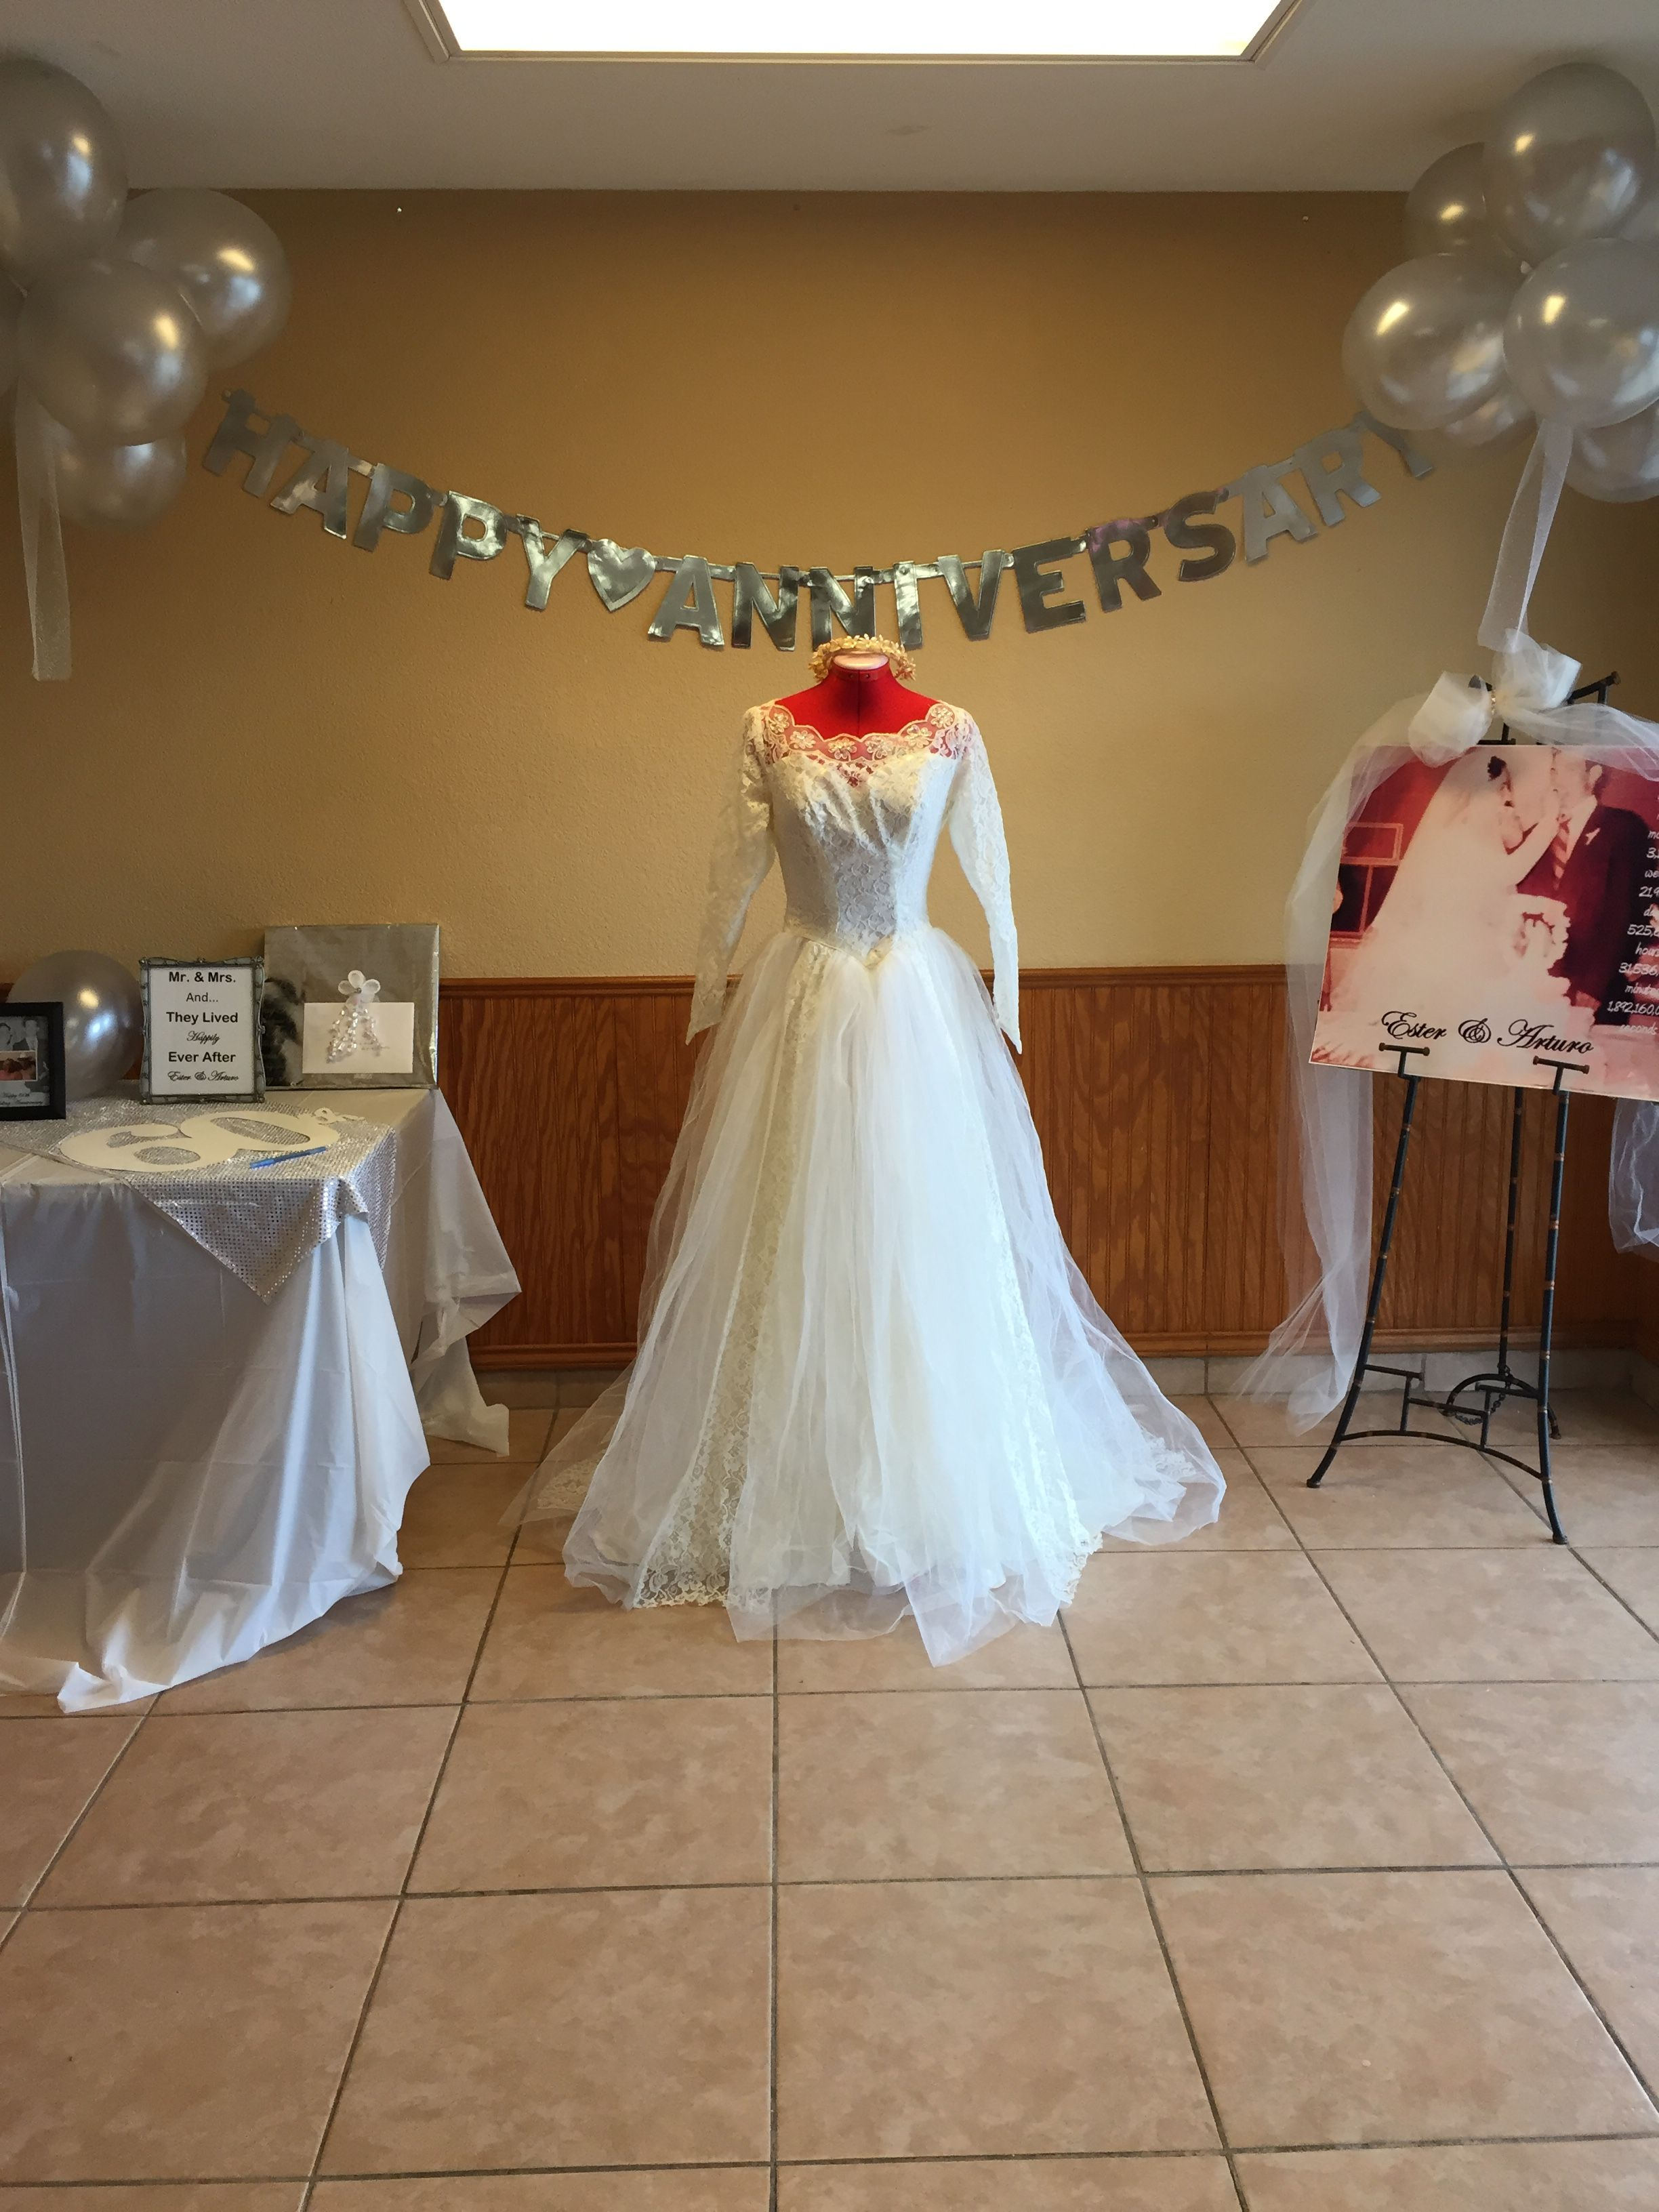 Th wedding anniversaryding dress display party